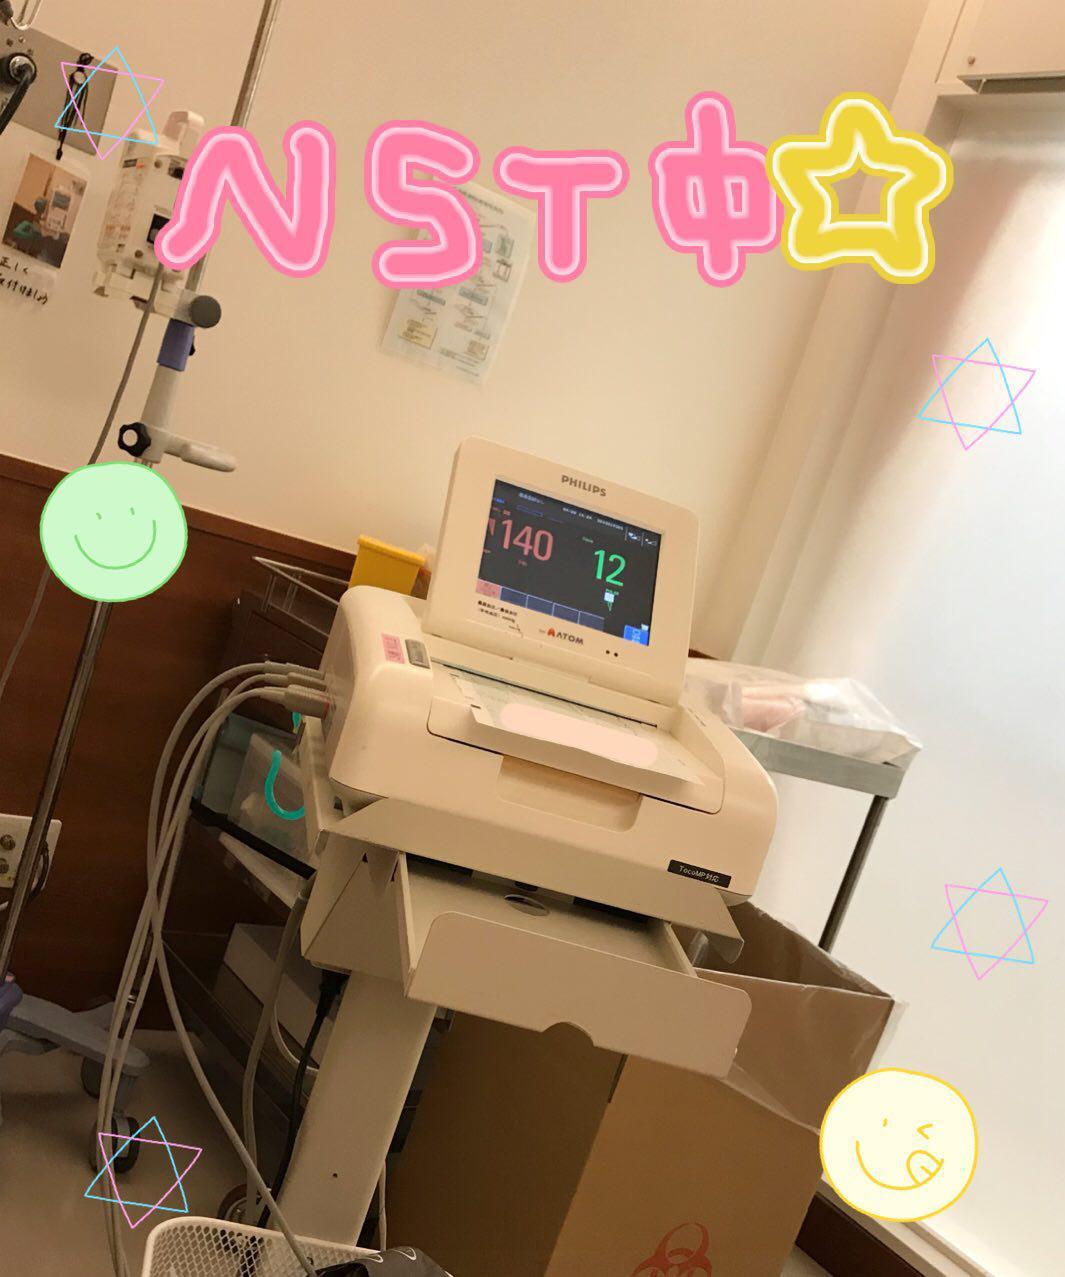 photo_2018-04-20_22-15-41.jpg